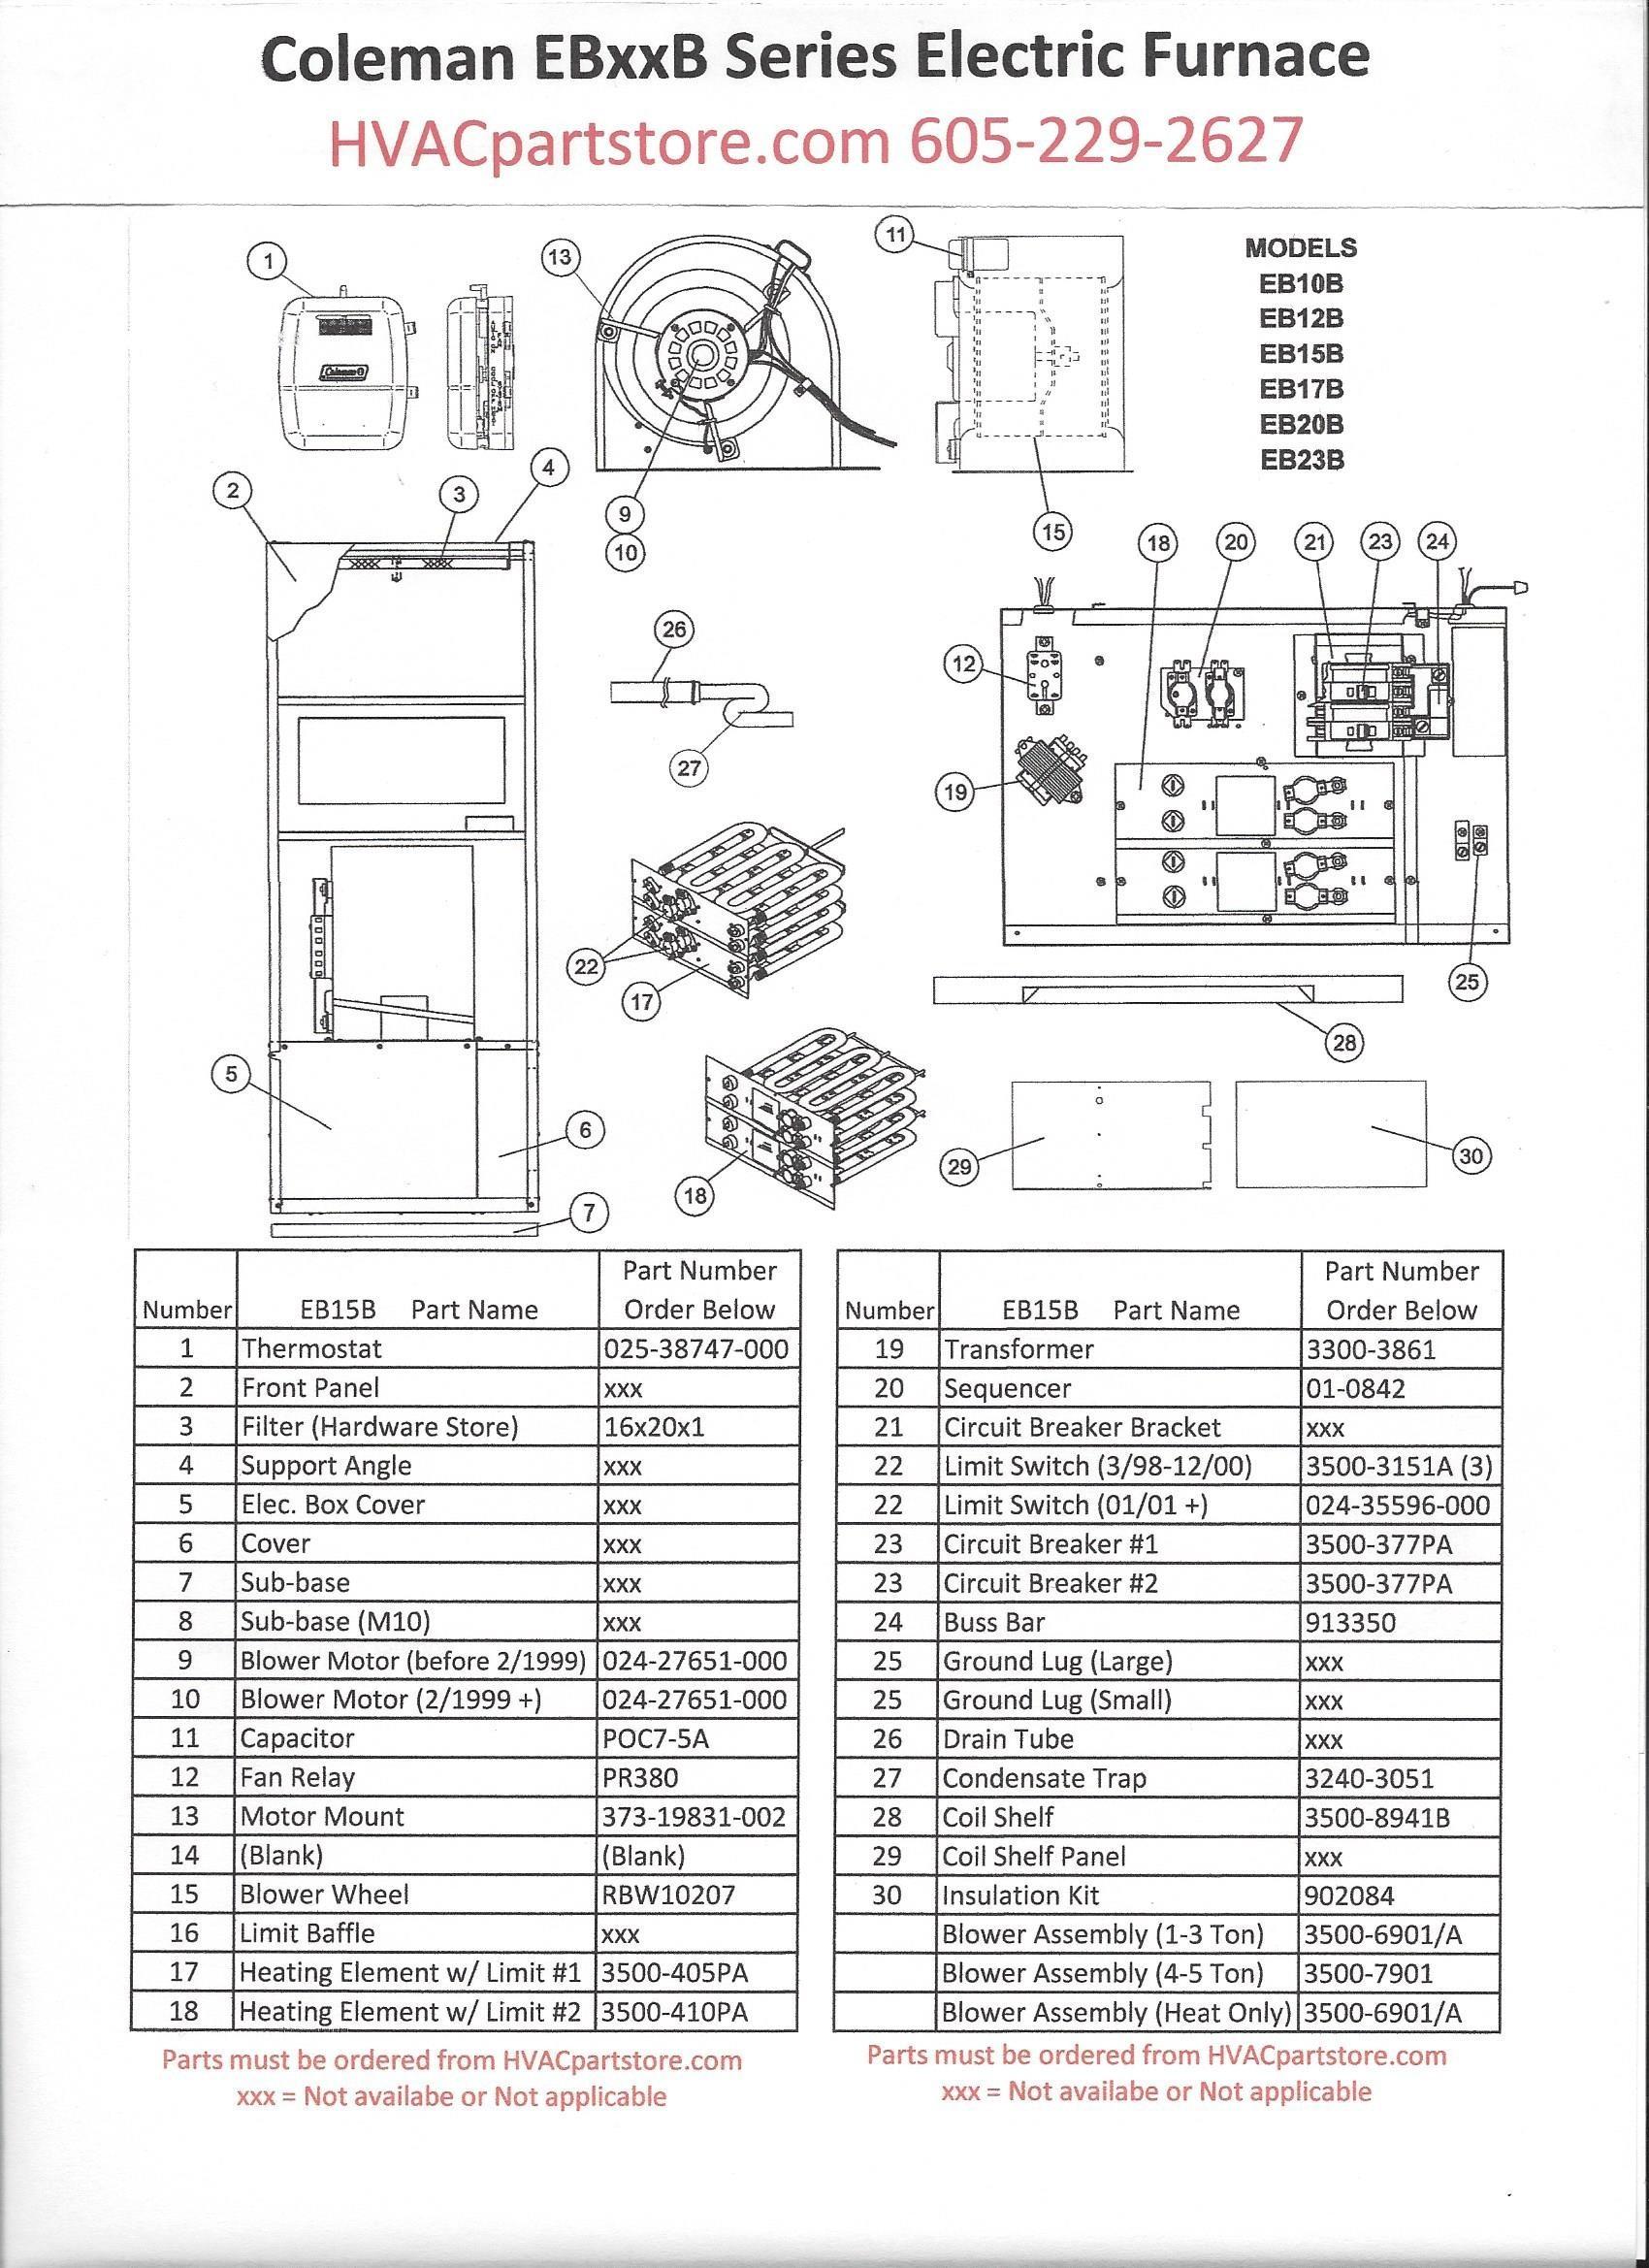 Gibson Hvac Wiring Diagram Inspirationa Wiring Diagram for Intertherm Electric Furnace Unusual nordyne